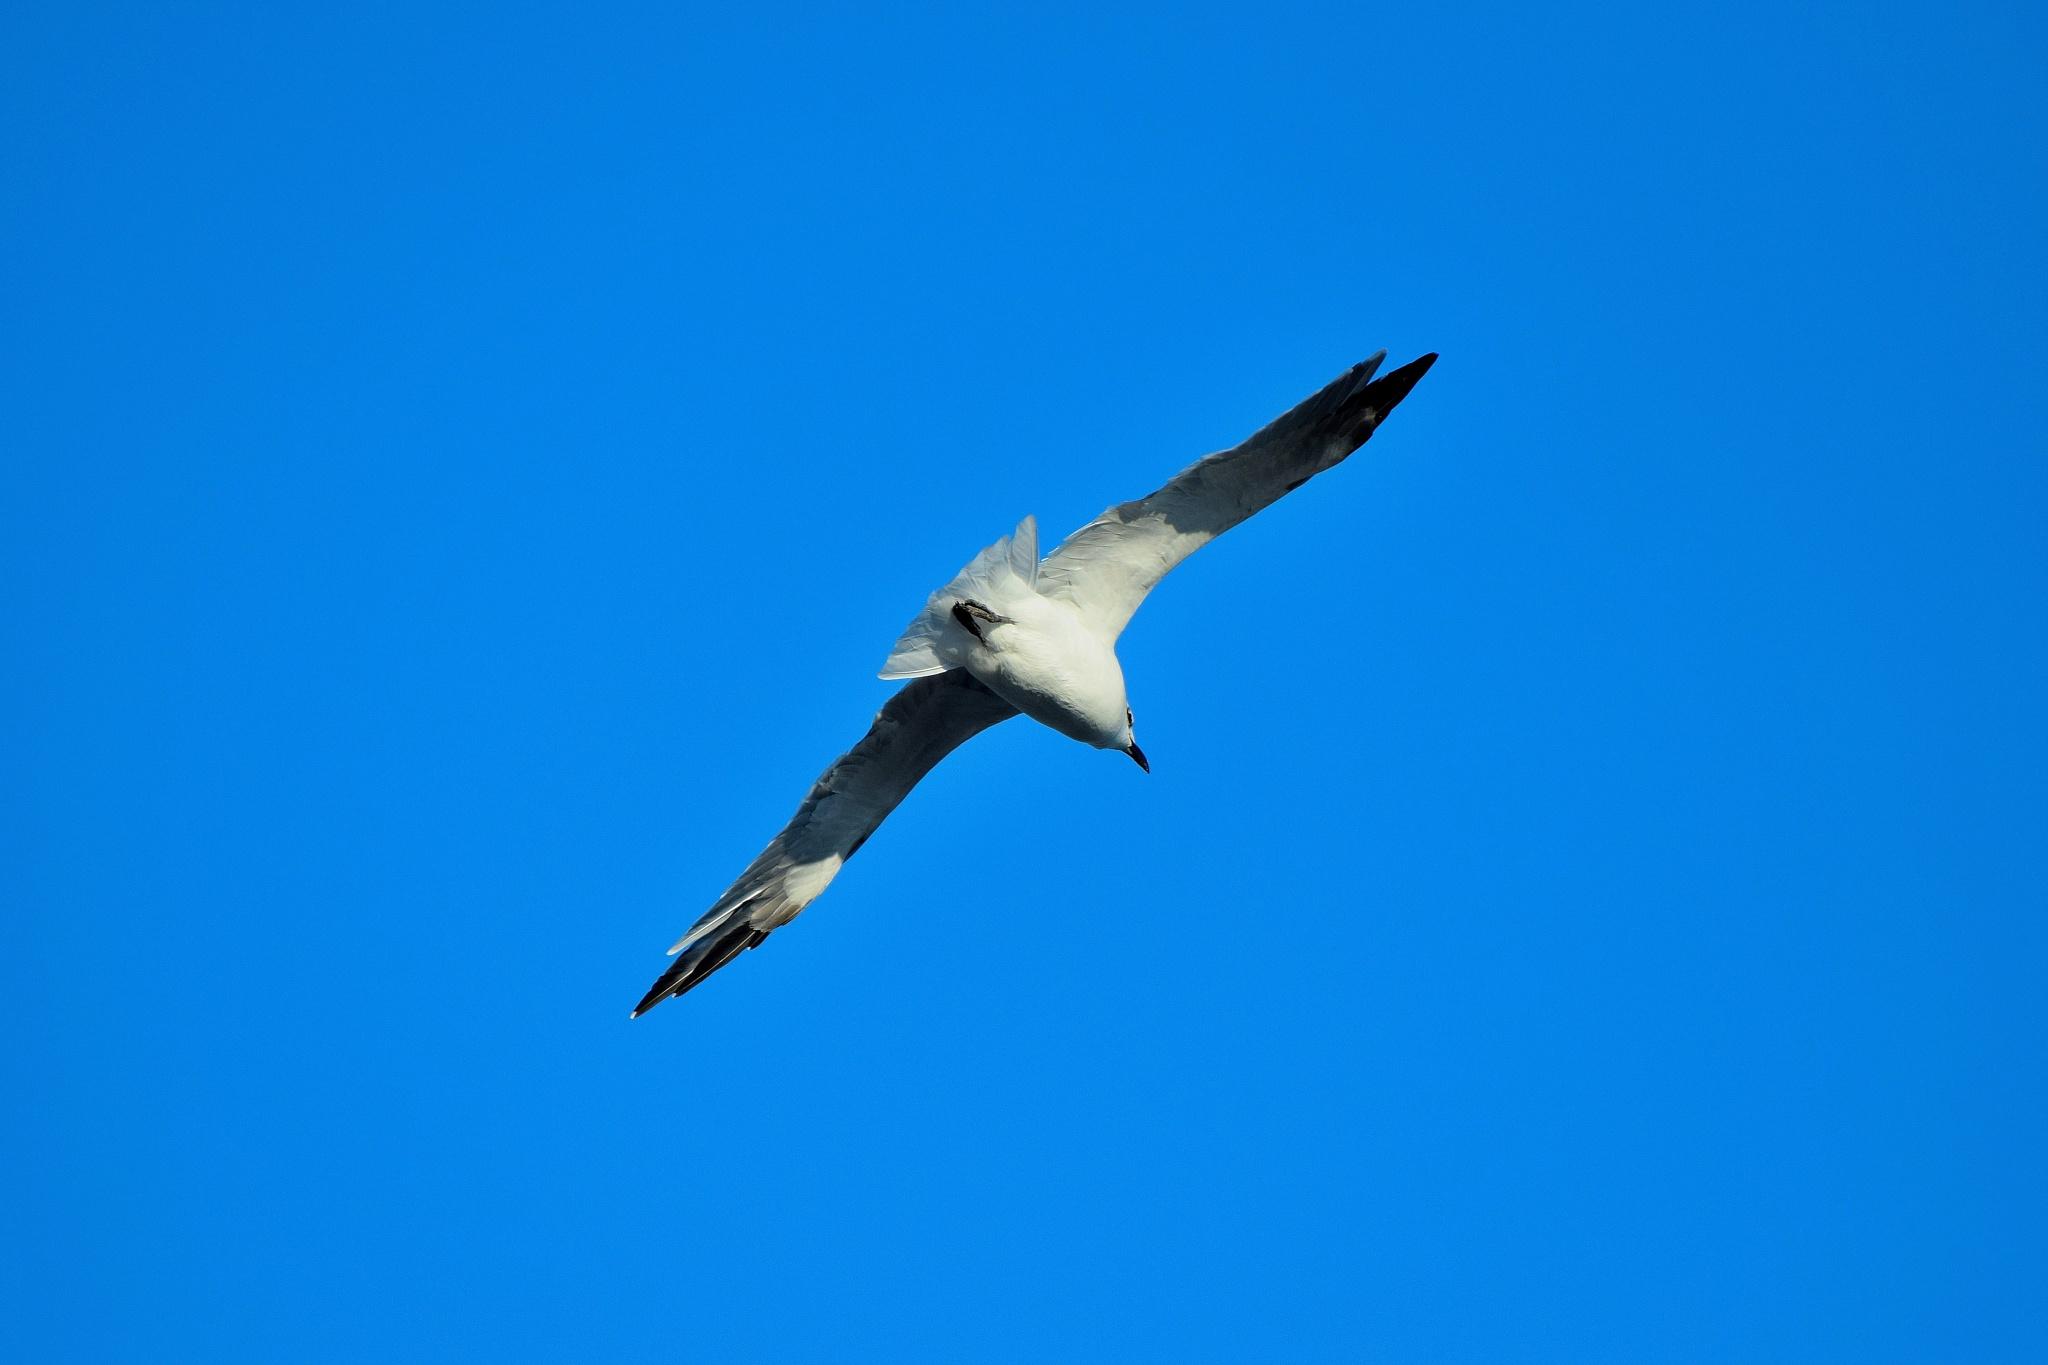 Galveston Birds 77 by Lawrence Scott Hess